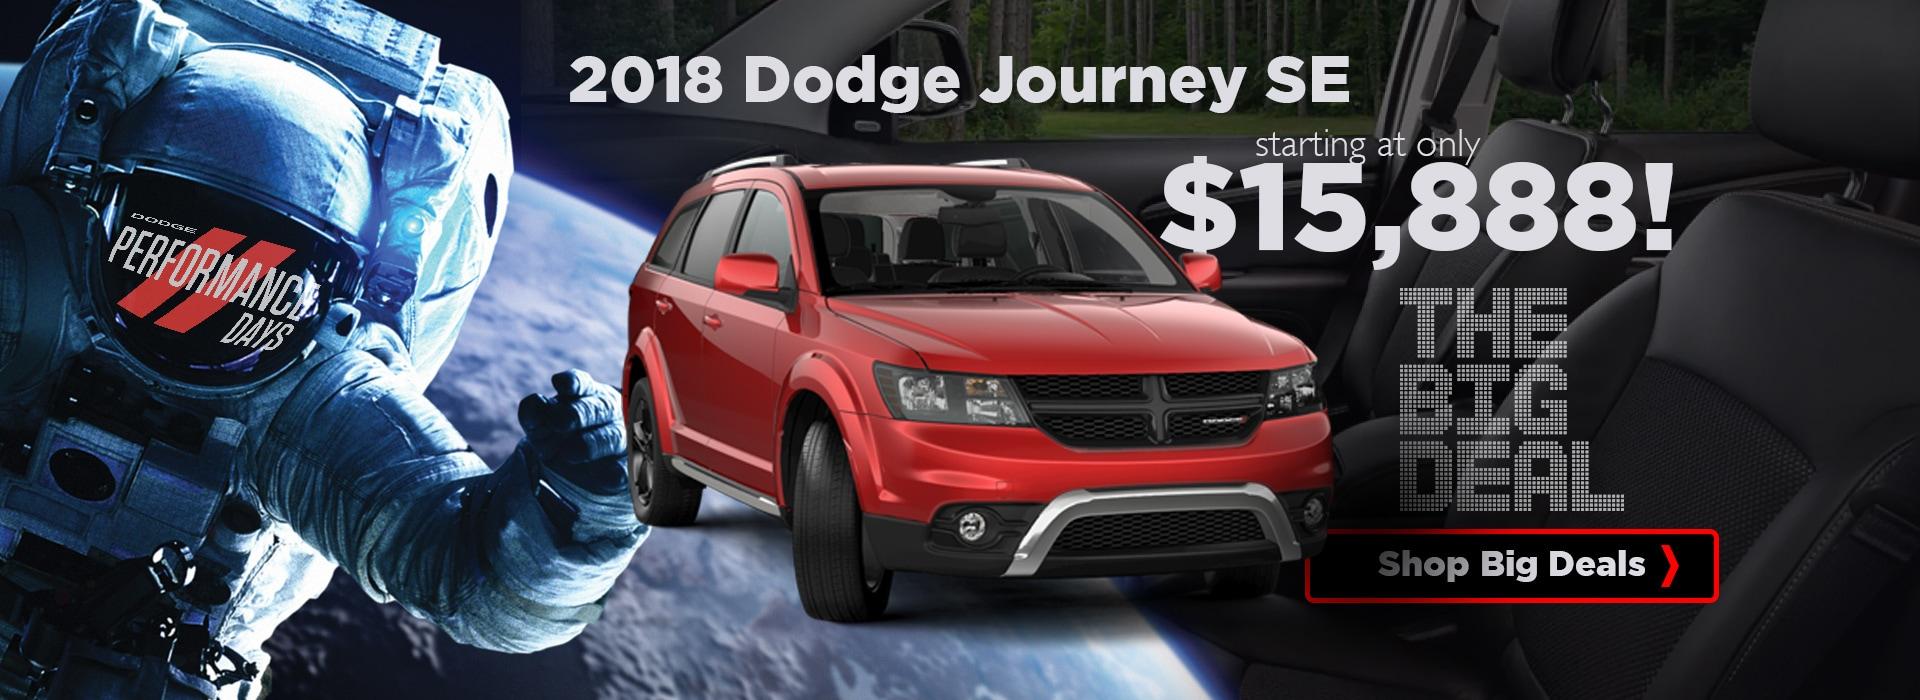 Larry H Miller Dodge Ram Tucson New Used Car Dealership In